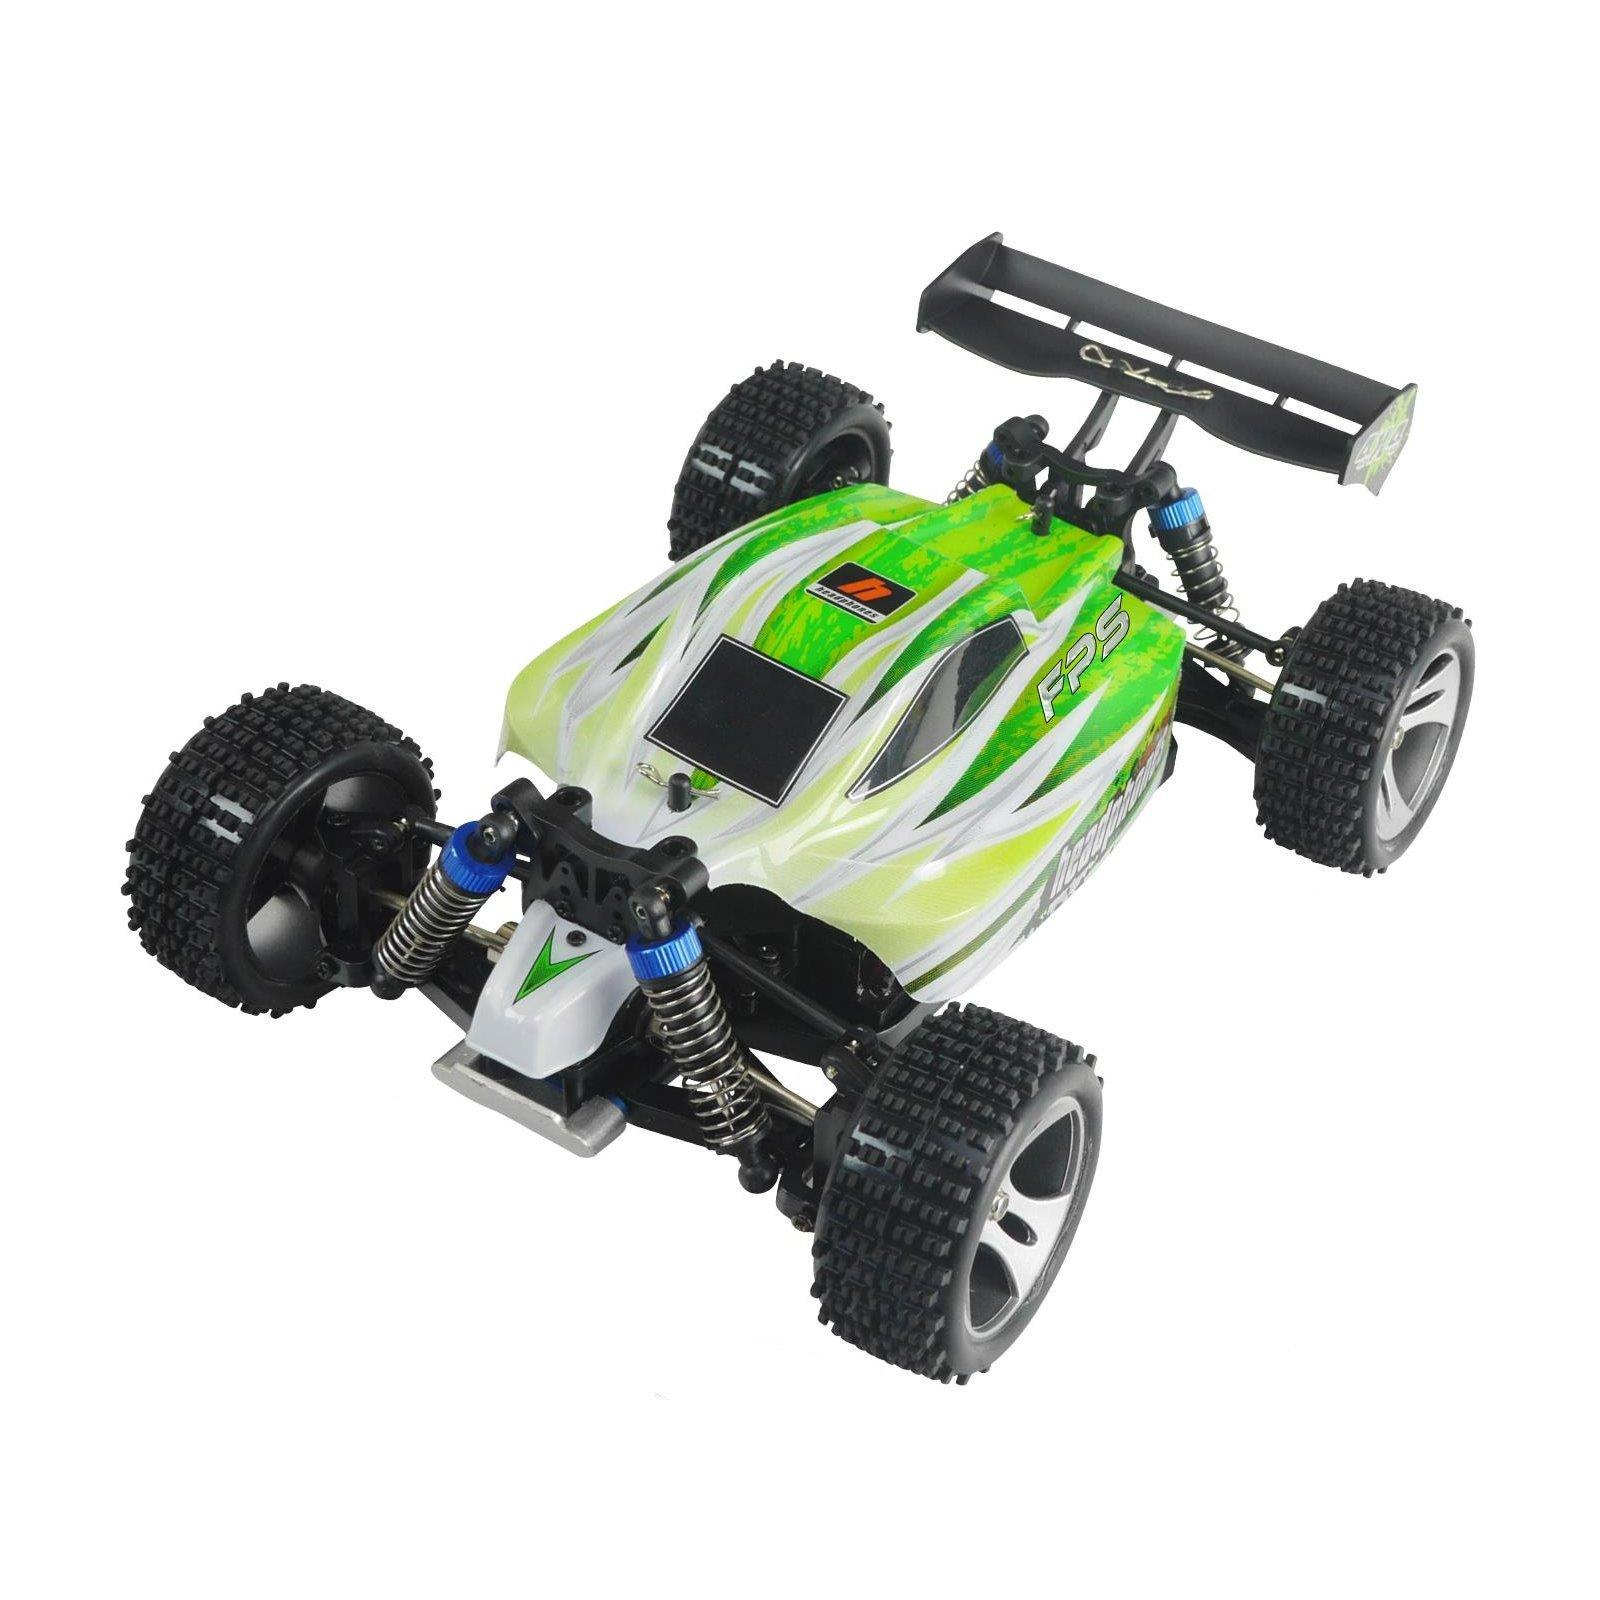 Rayline Funrace 01 S FR01 S RC Buggy mit Zubehör 1x Akku